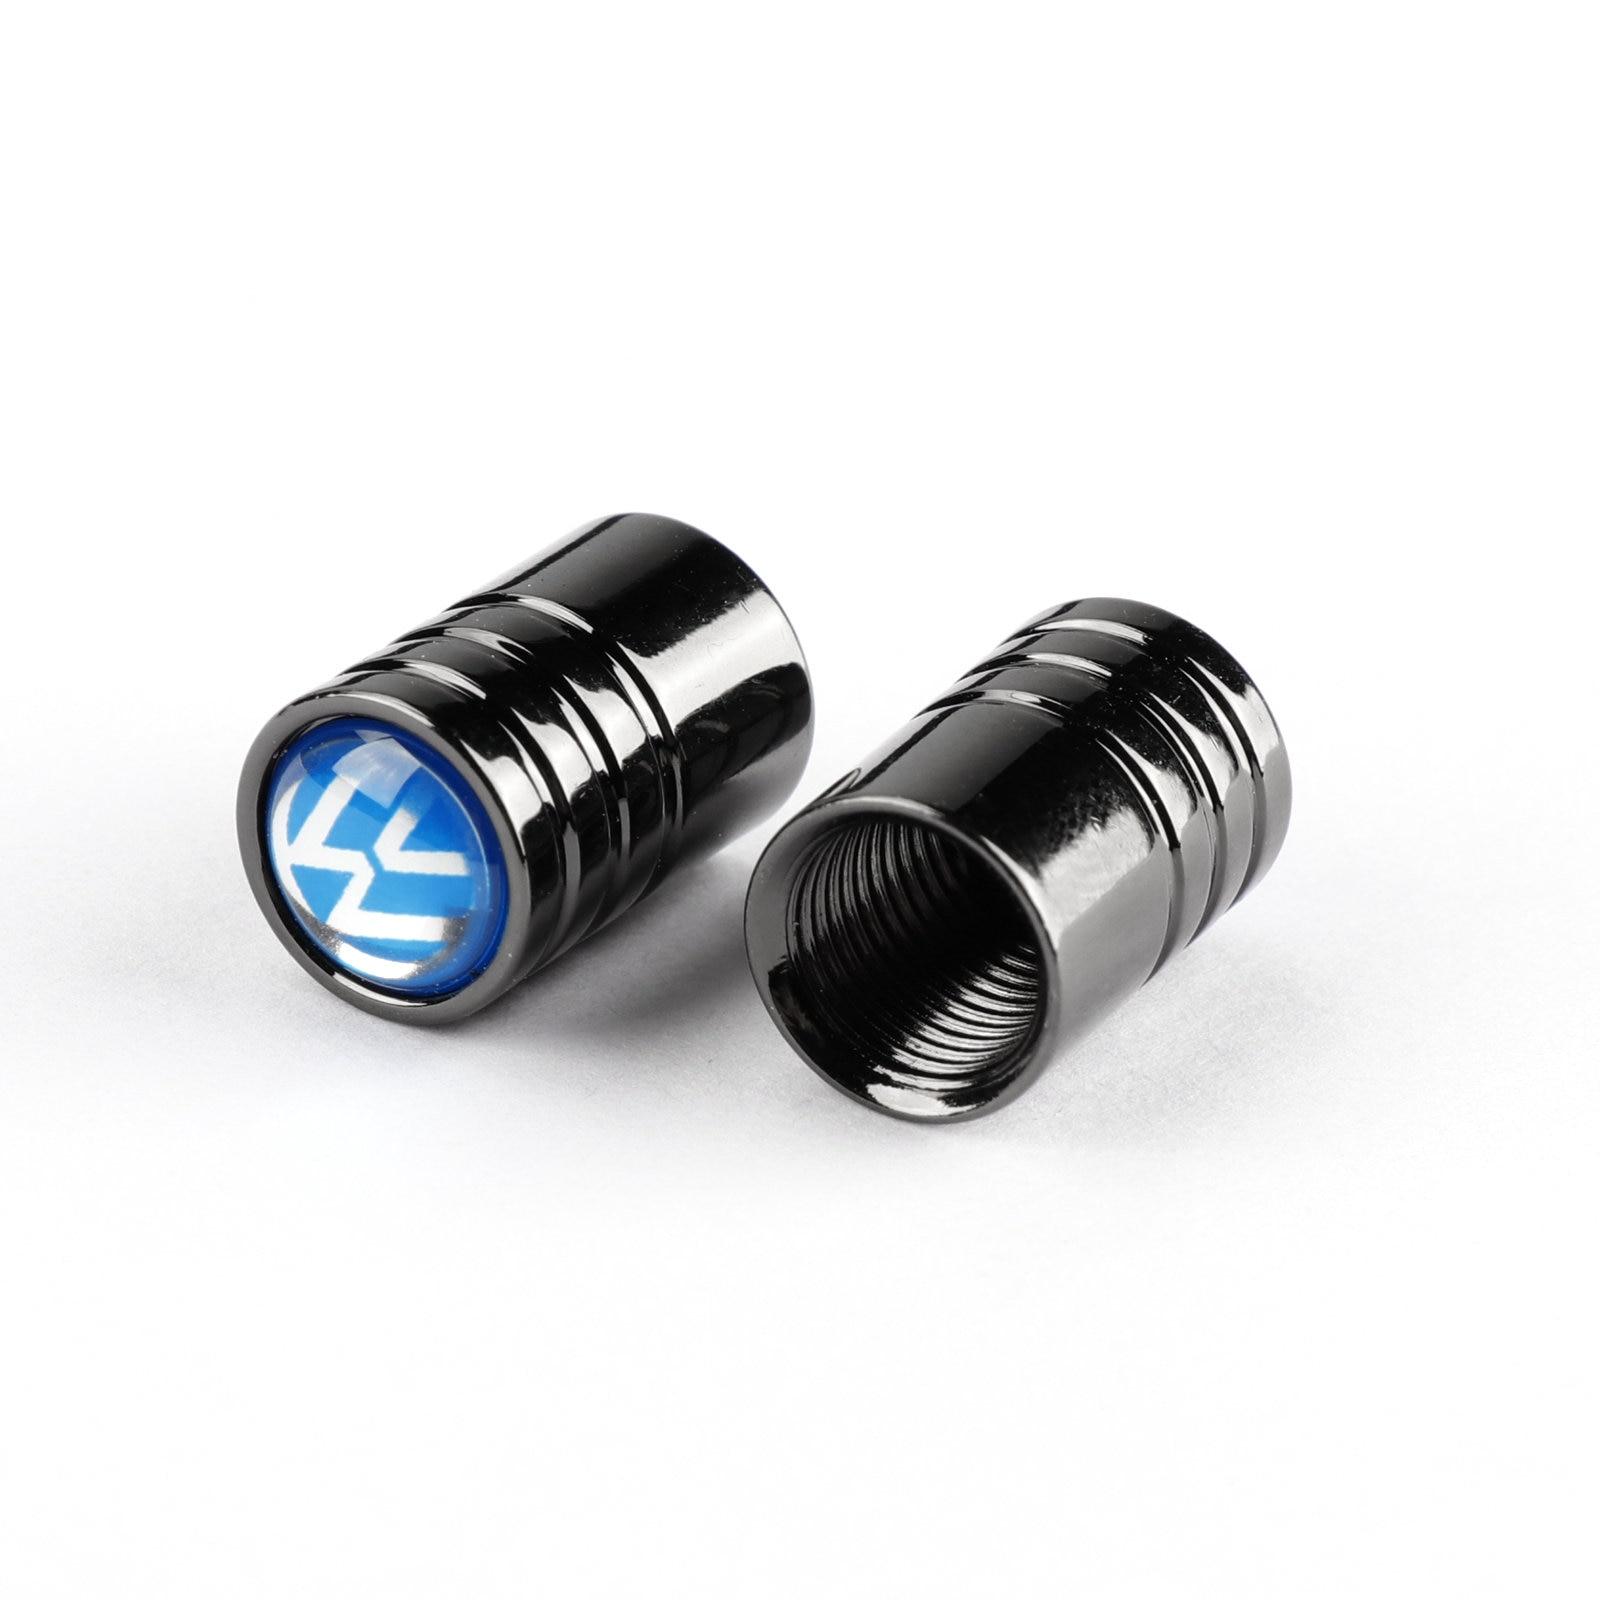 lowest price New OEM 14956-EB70B 14956EB70B Vacuum Turbo Boost Pressure Converter Valve For Nissan Pathfinder R51 Navara D40 Cabstar 2 5dCi